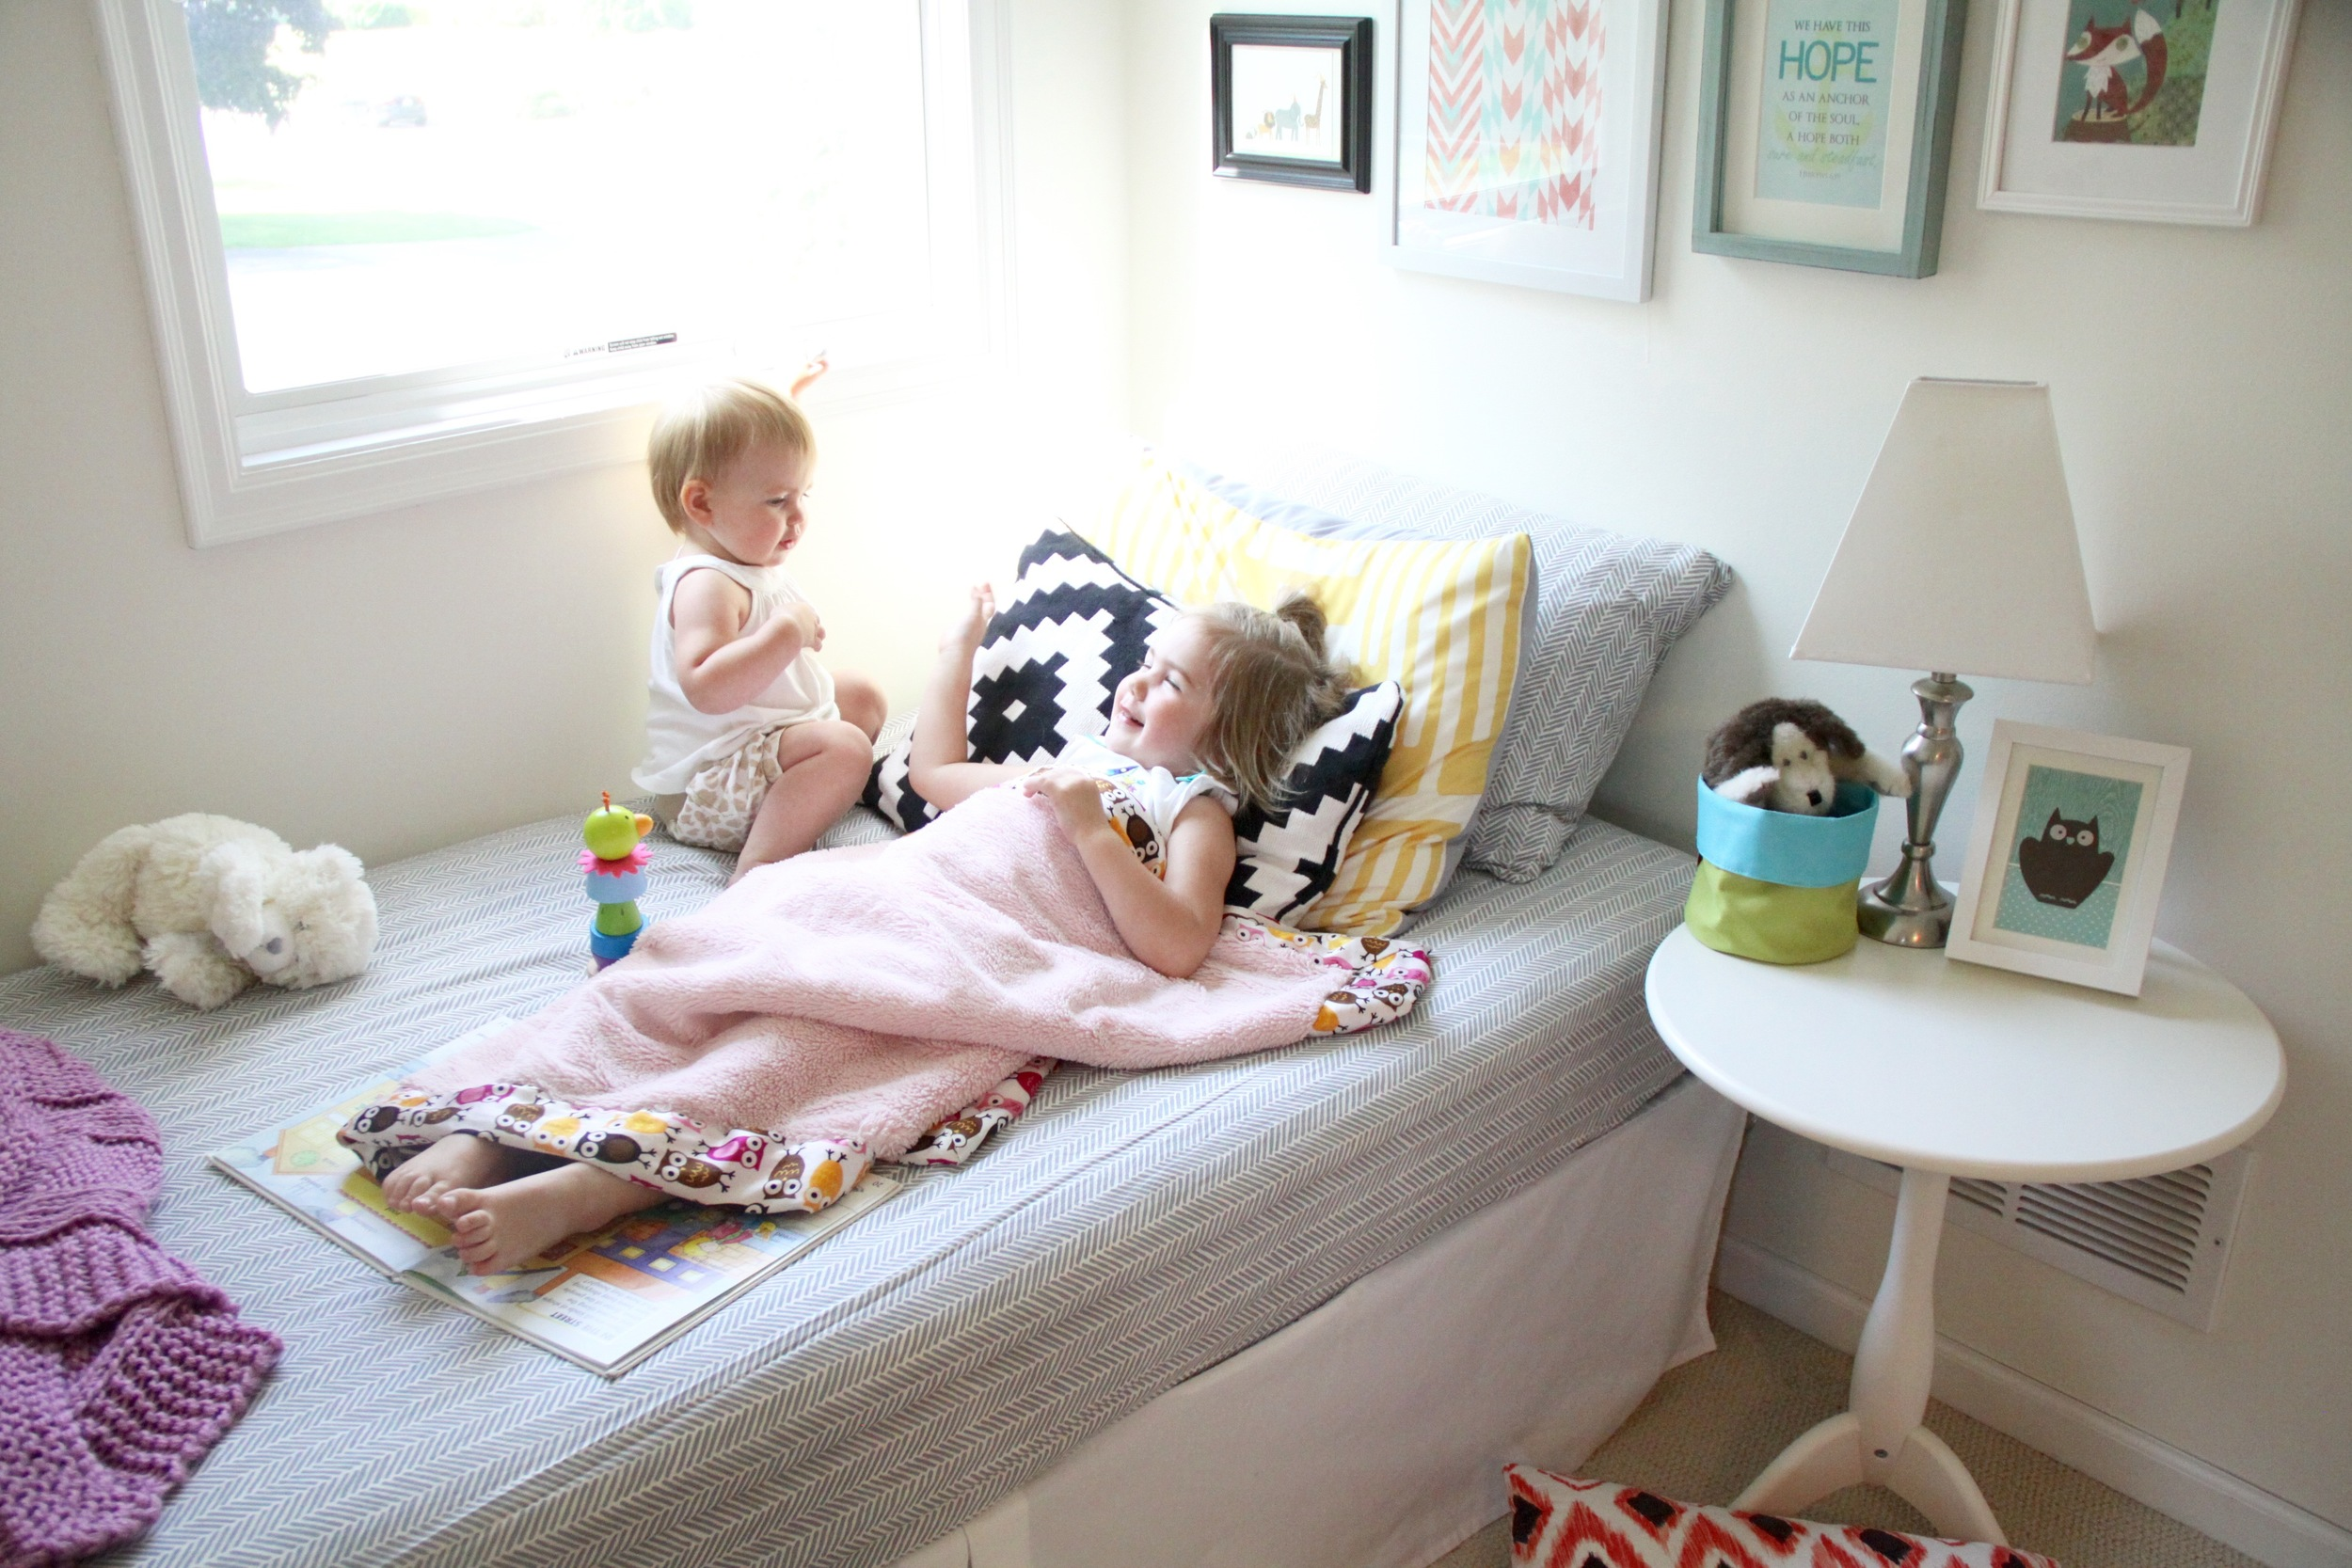 A happy and bright nursery